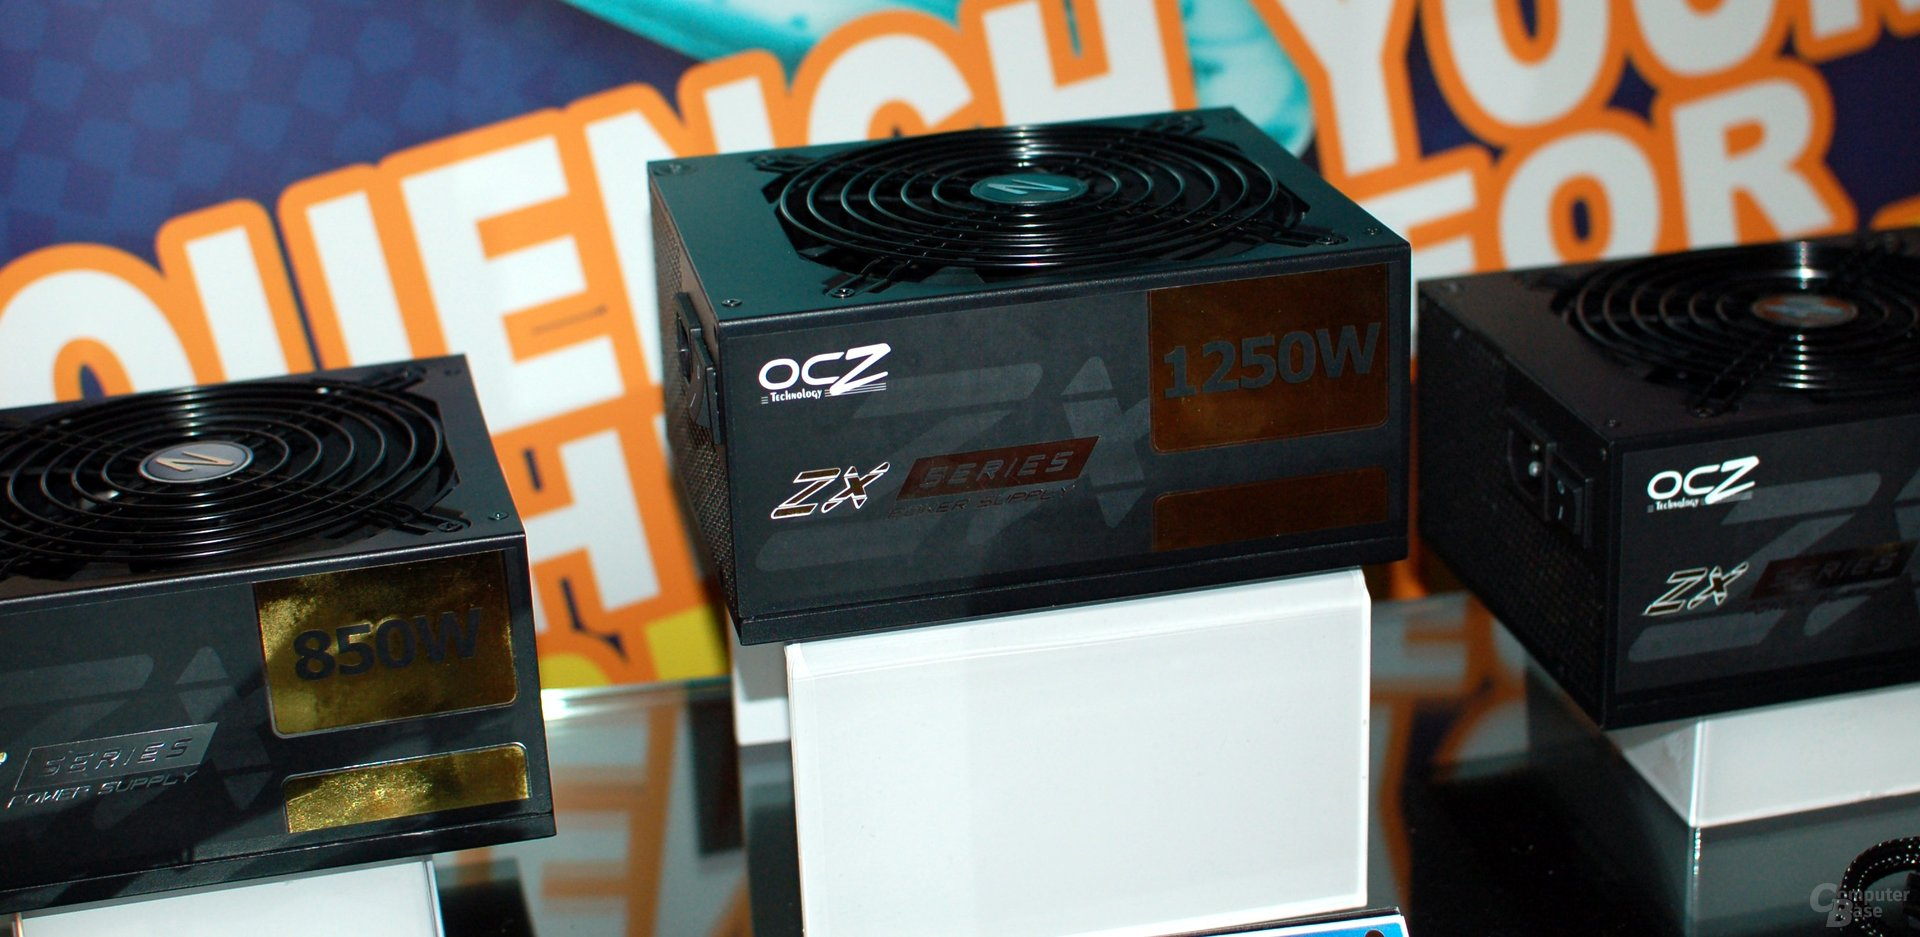 OCZ ZX Series